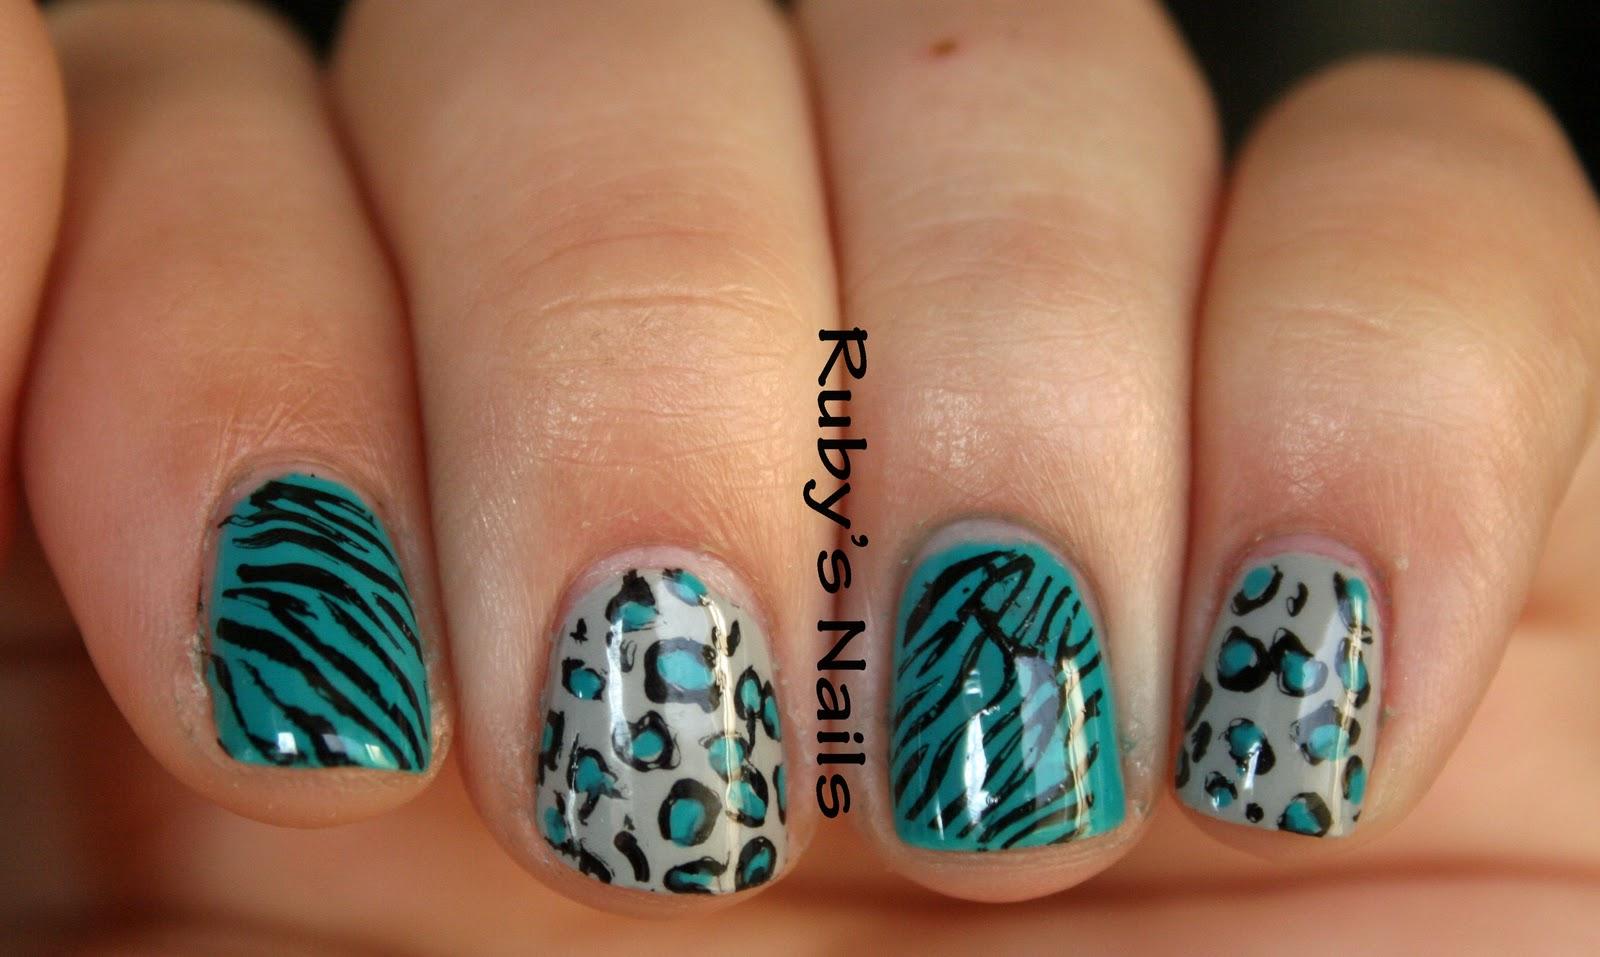 The Amusing Zebra print nail designs acrylic nails Digital Photography